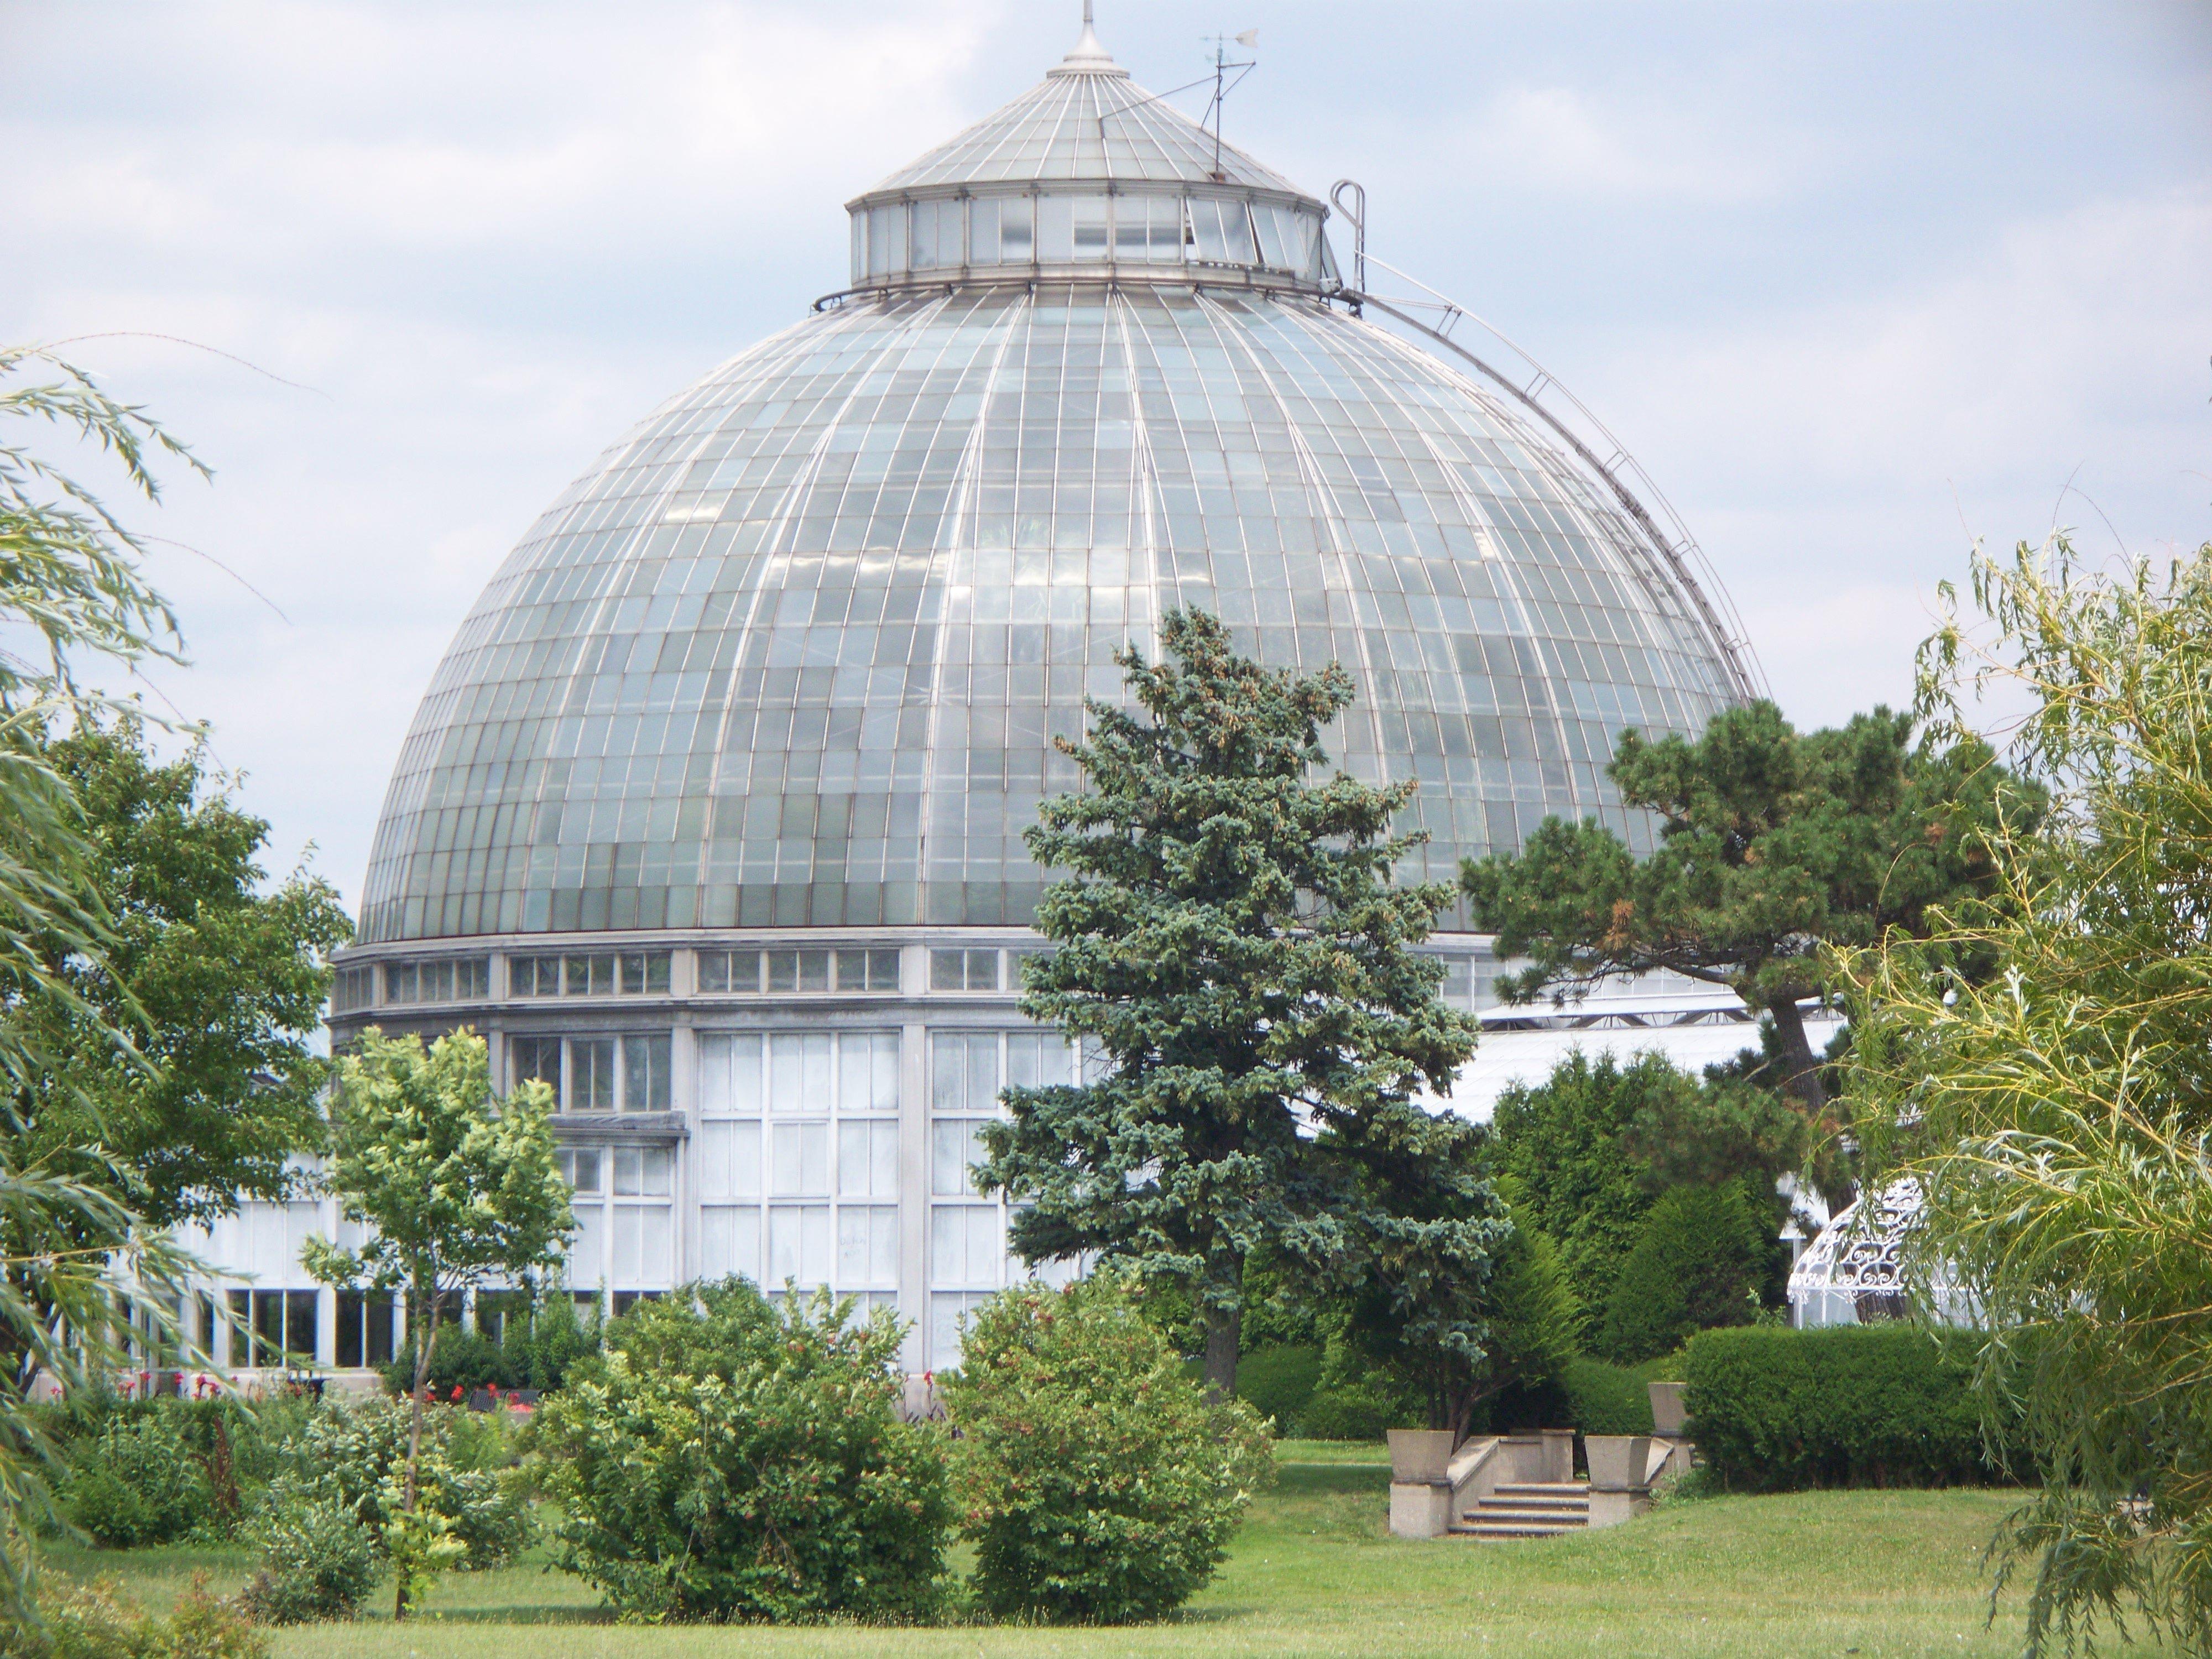 Belle Isle Conservatory